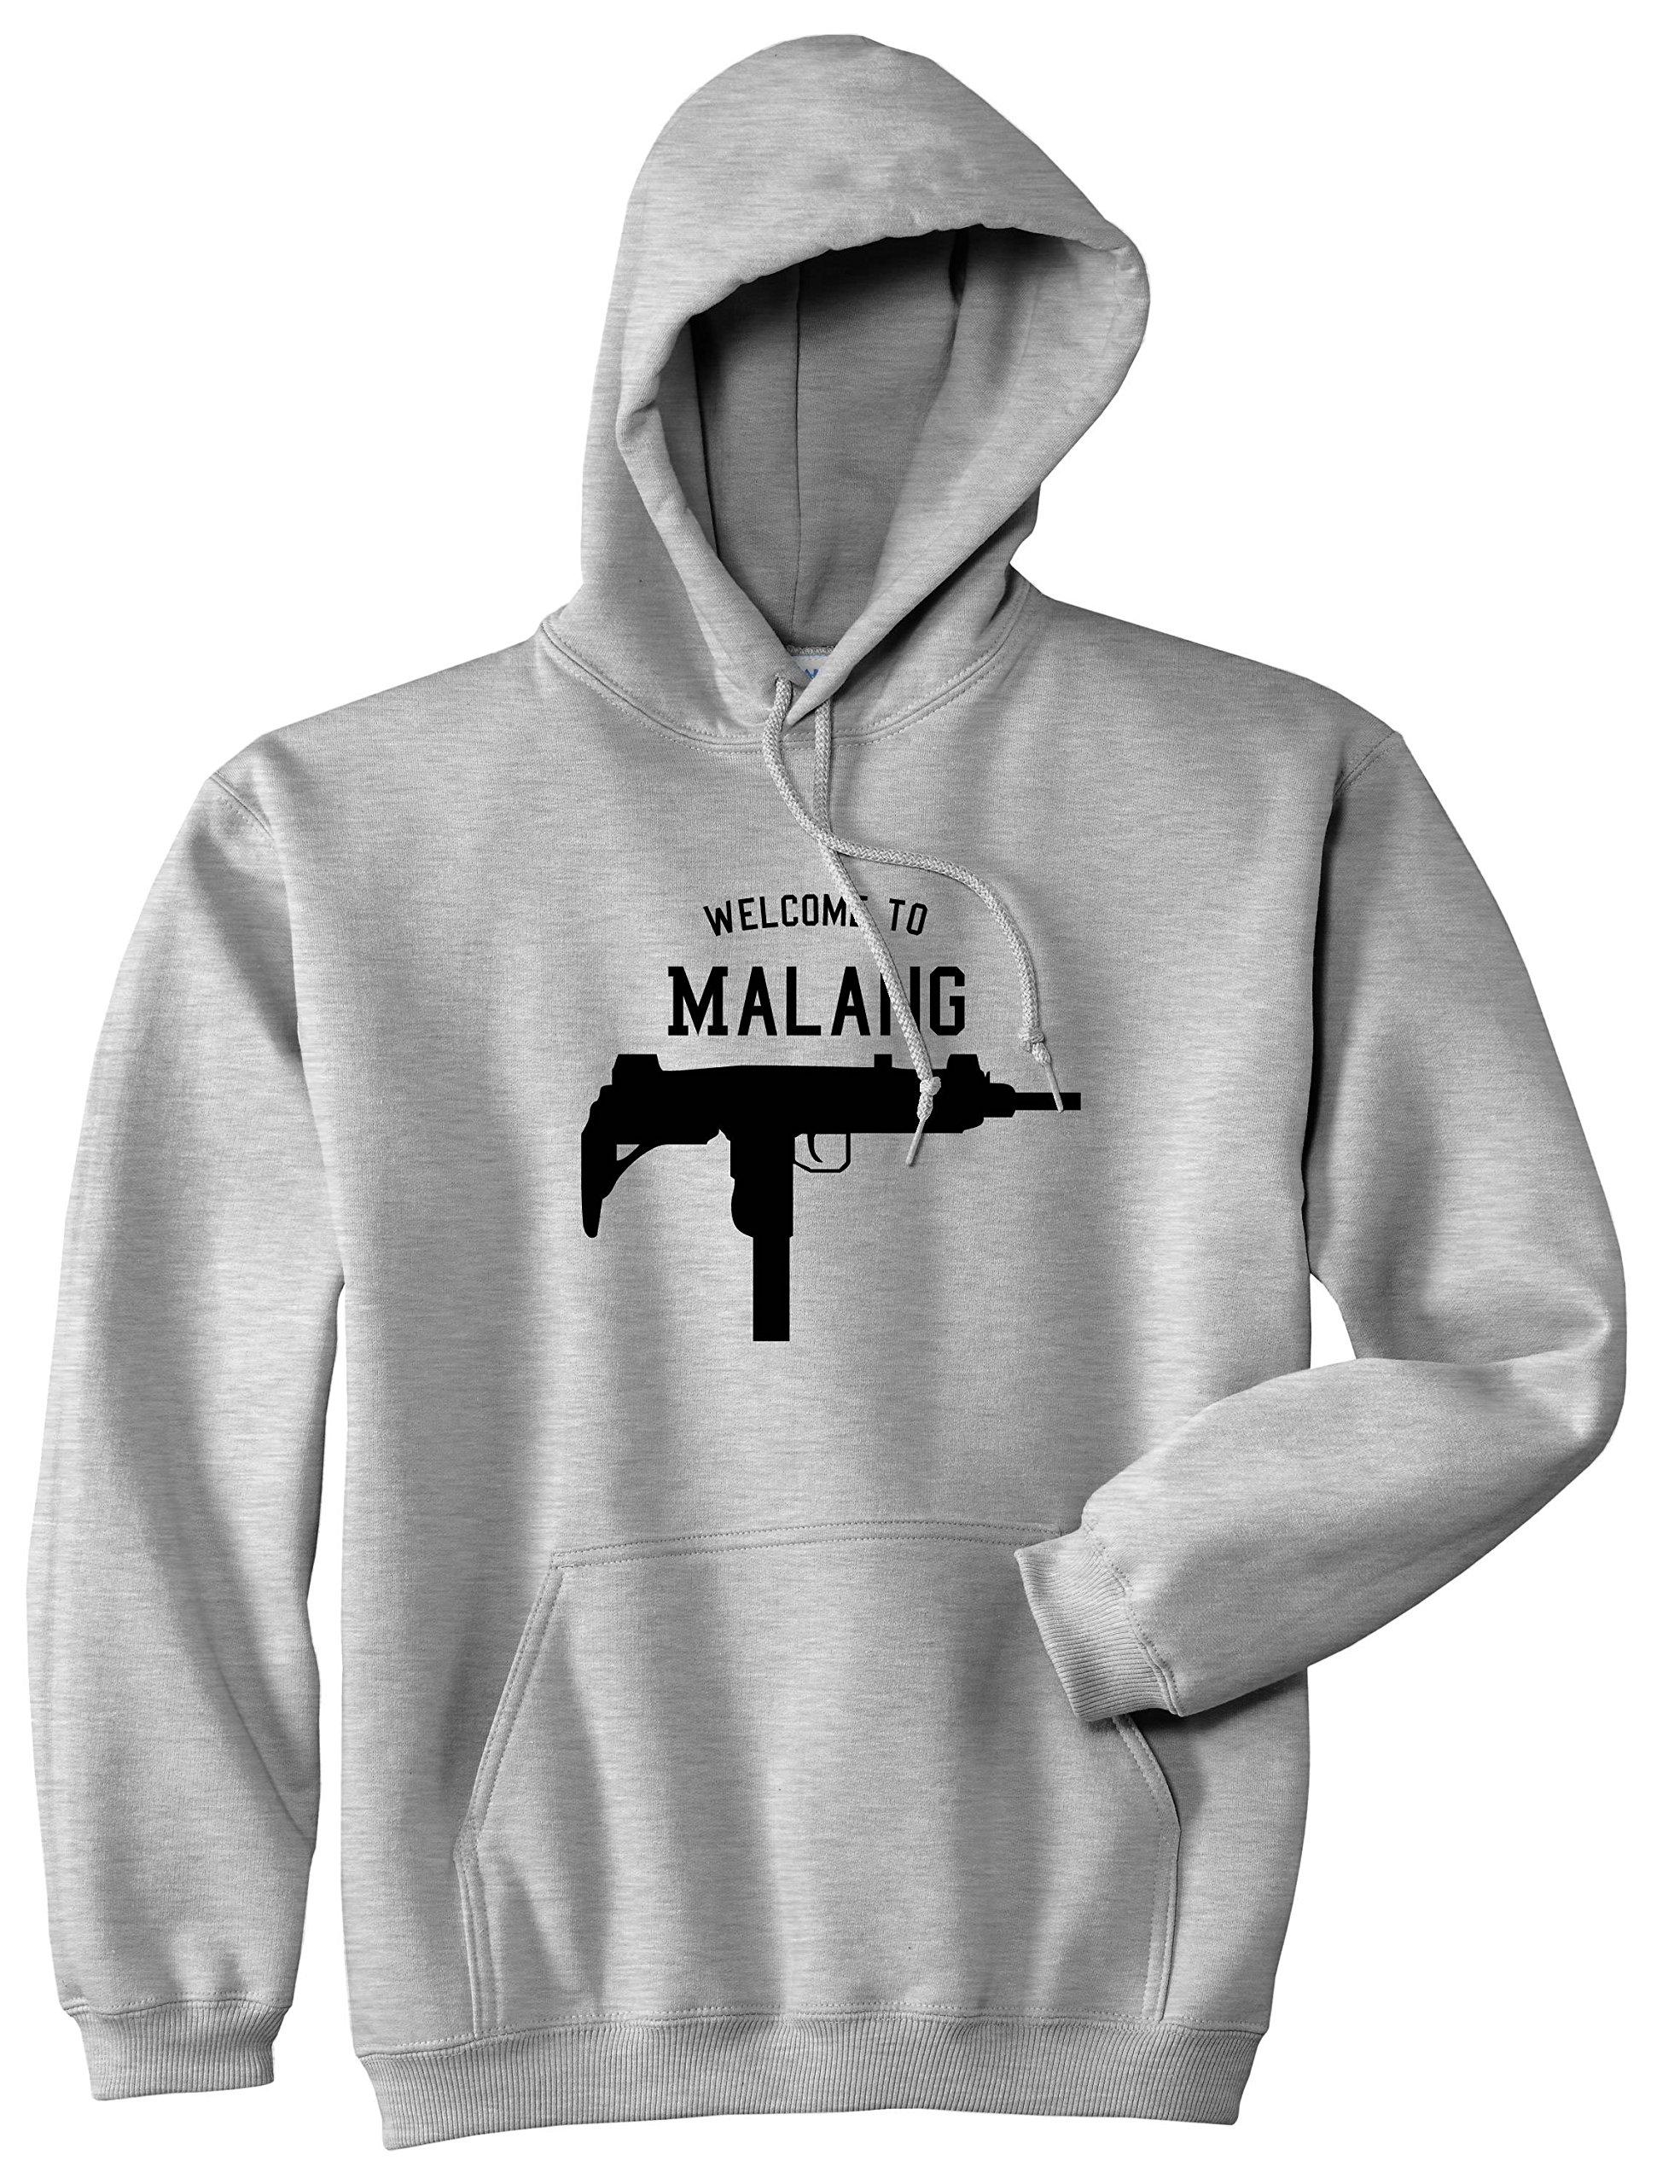 Welcome To Malang Uzi Machine Gun City Pullover Hoodie Hoody Small Grey Amazon Com Books